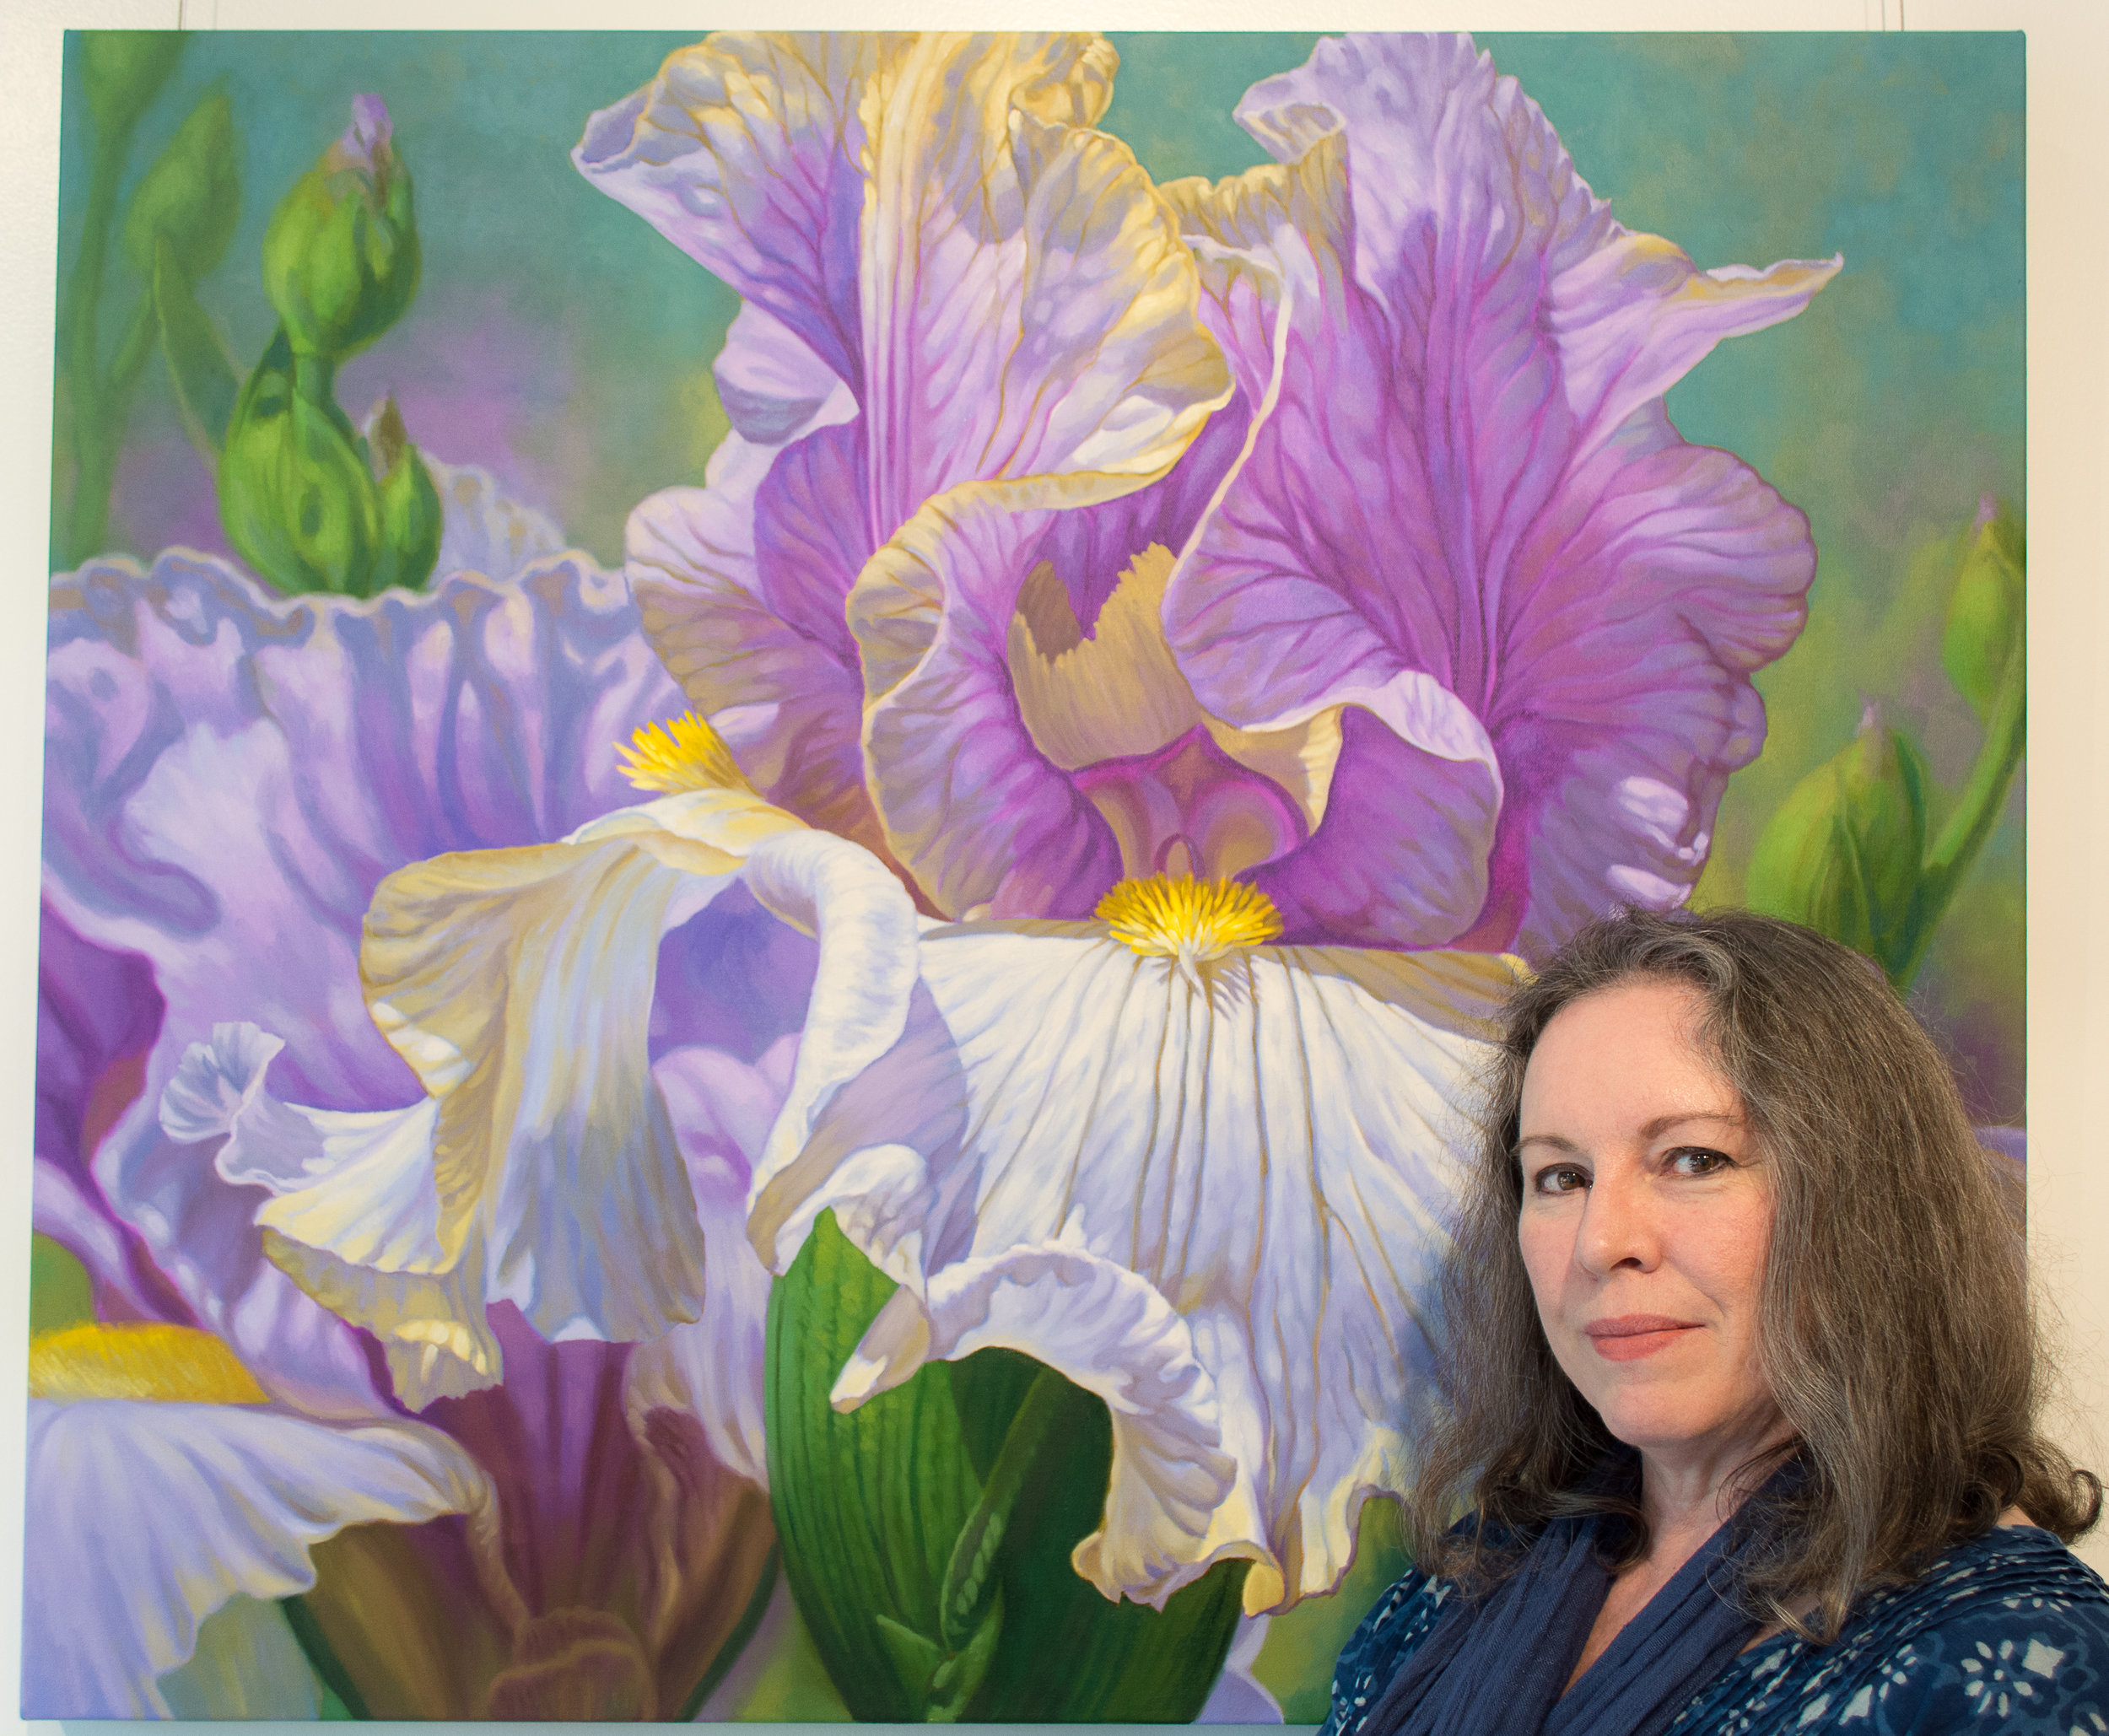 "Fiona Craig with 'Floralscape 4', oils, 42"" x 36"" x 1.5""., Chicago, 2018."